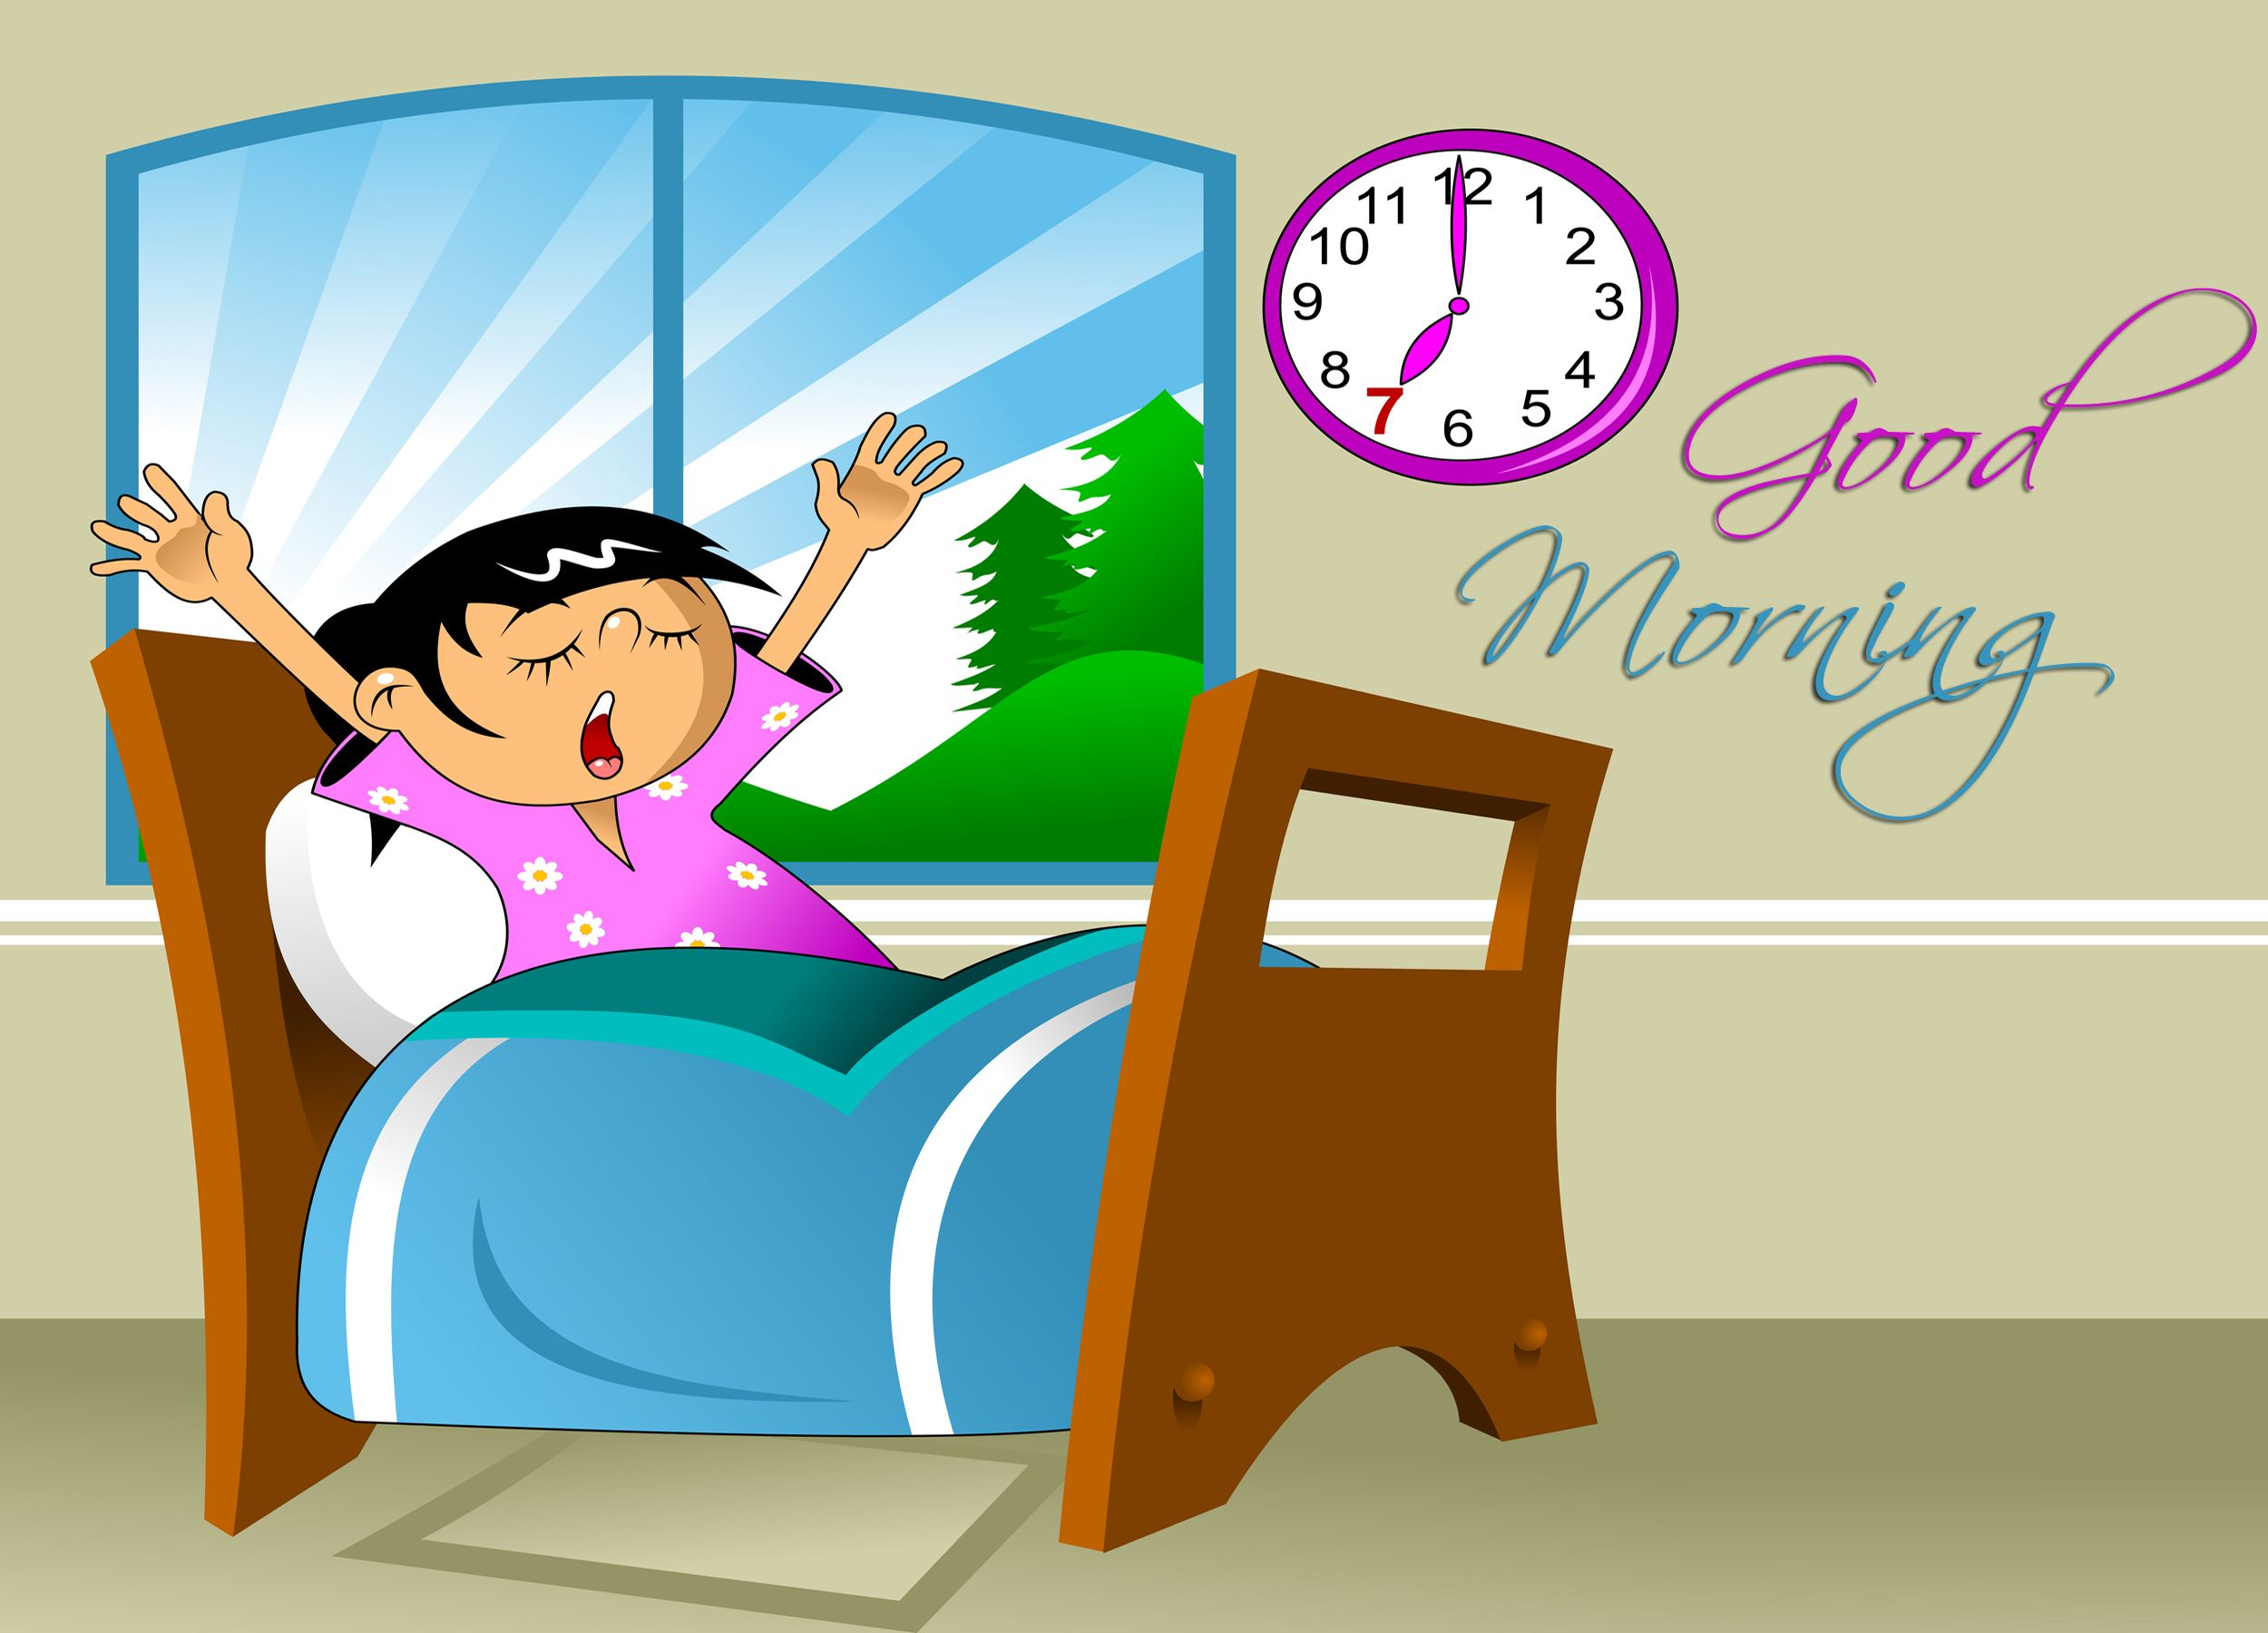 Hd wallpaper of good morning - Get Up Good Morning Hd Wallpaper